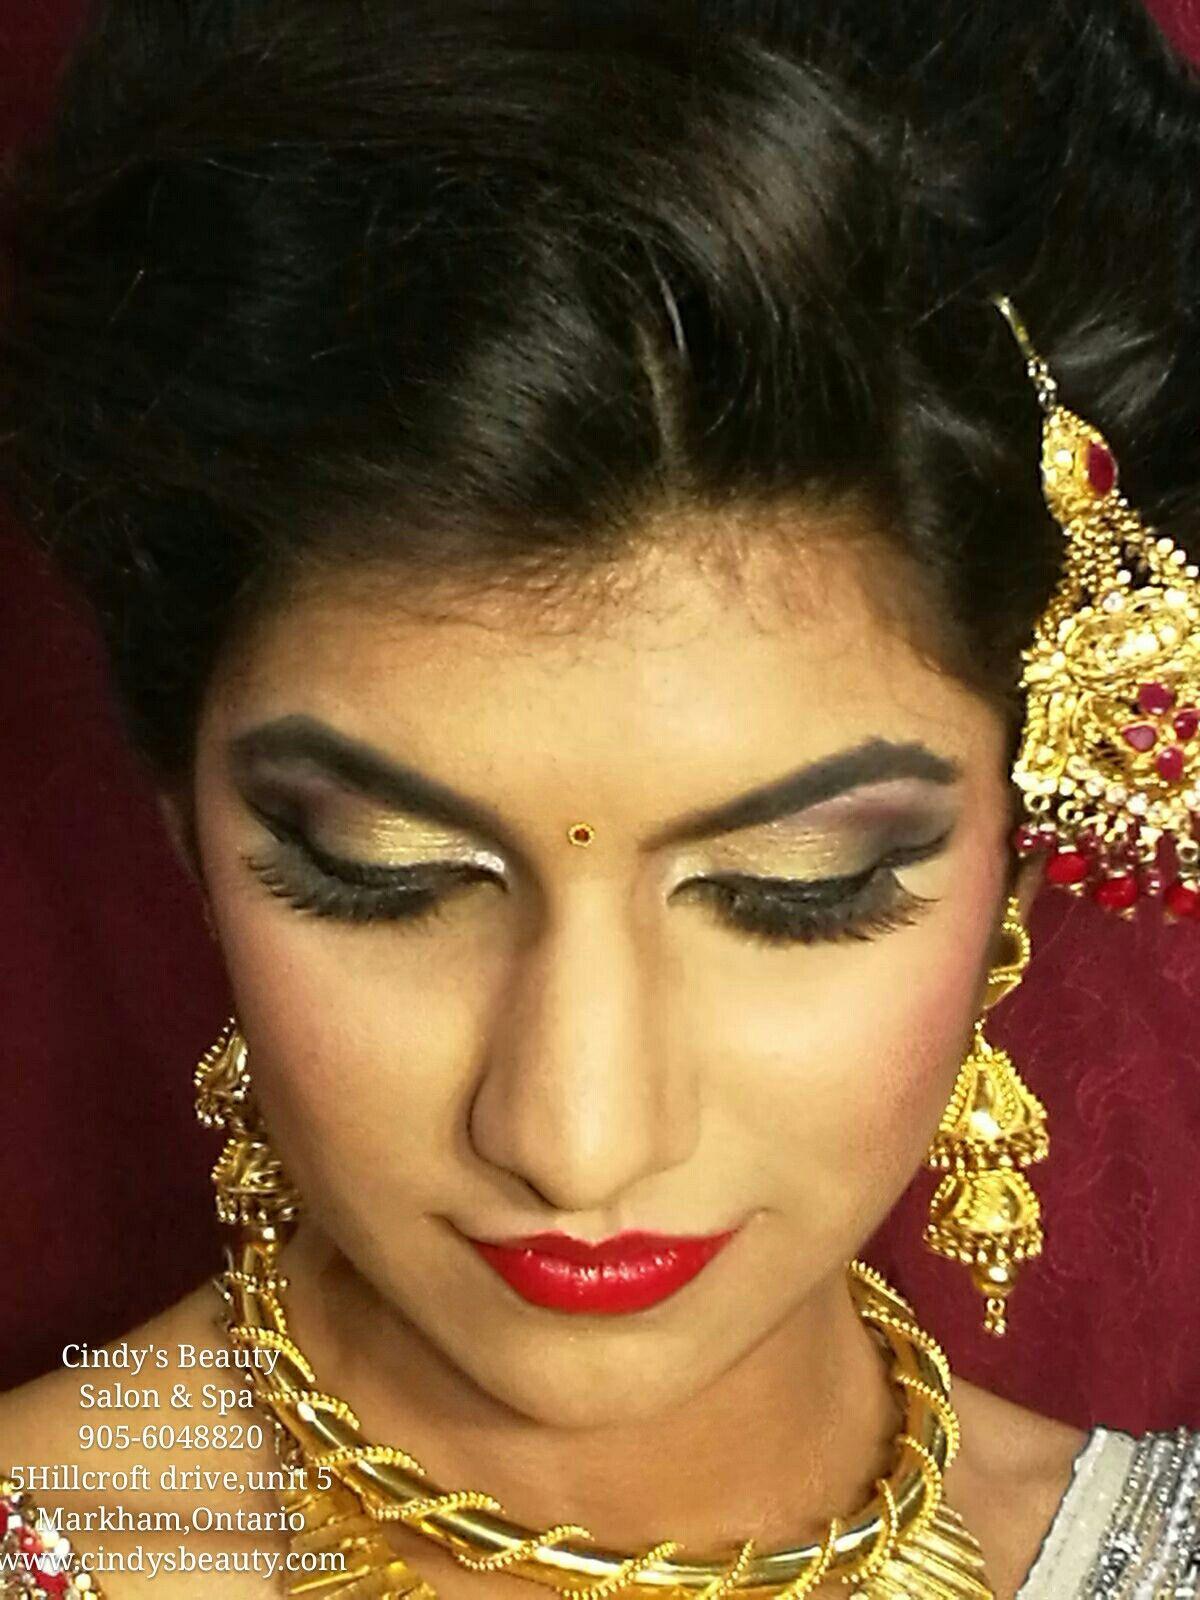 cindysbeauty #salon #spa #party #hair #makeup #south #indian